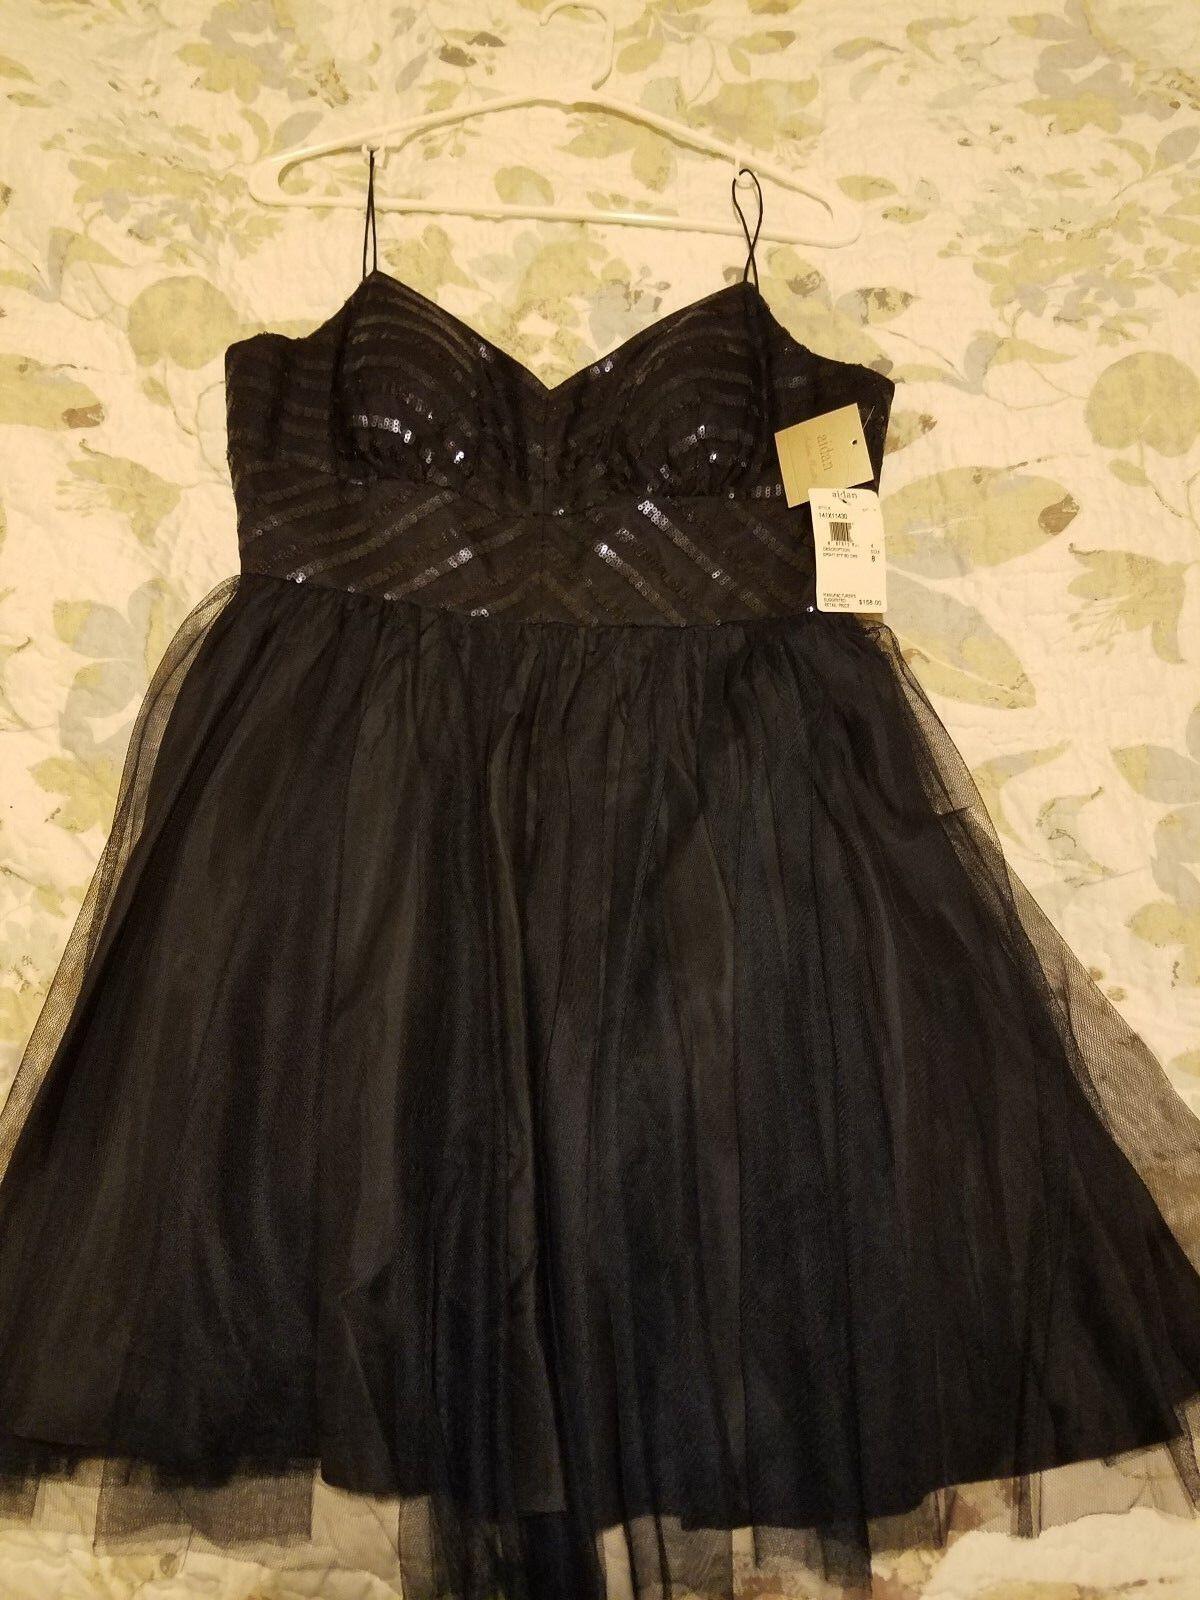 New dark Blau cocktail dress with tag Größe 8